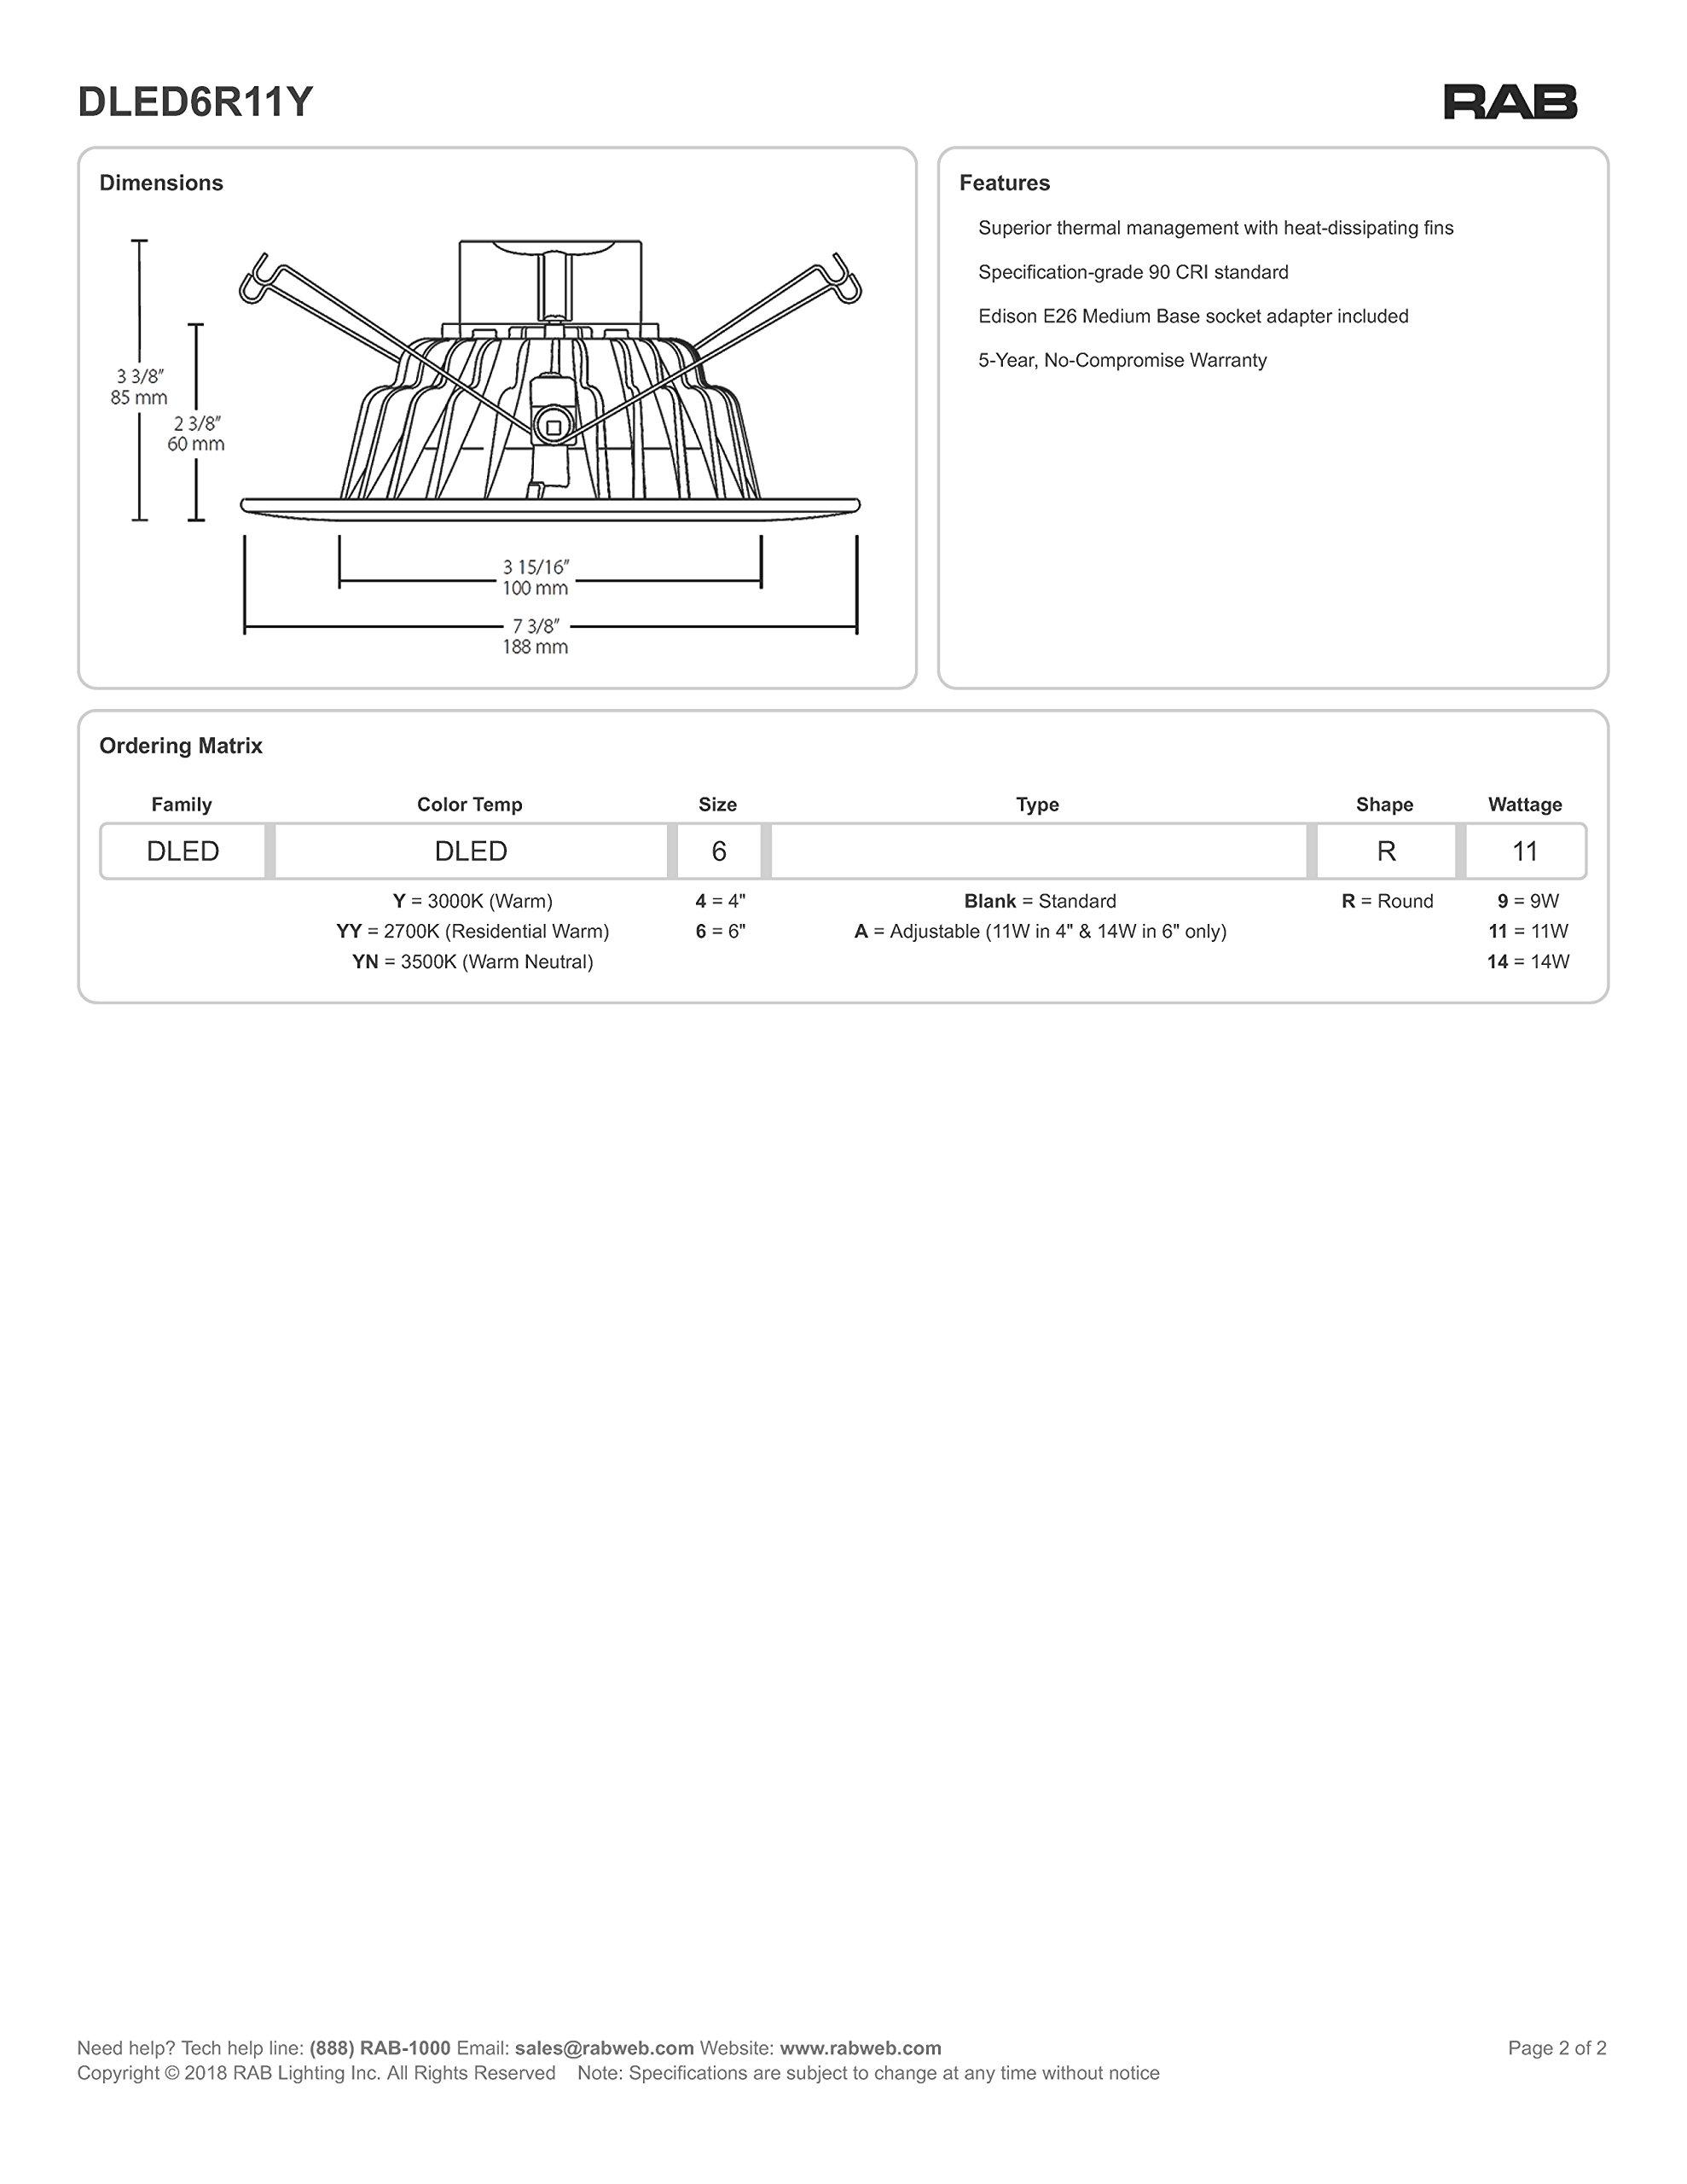 "6"" - 1Pk Can LED Lights & Recessed Retrofit Spotlights   2700K Warm White Lighting - Dimmable   11W   120V   842 Lumens   60Hz   Easy Installation Light Fixture Trim Rings (3000K 1 Pack)"